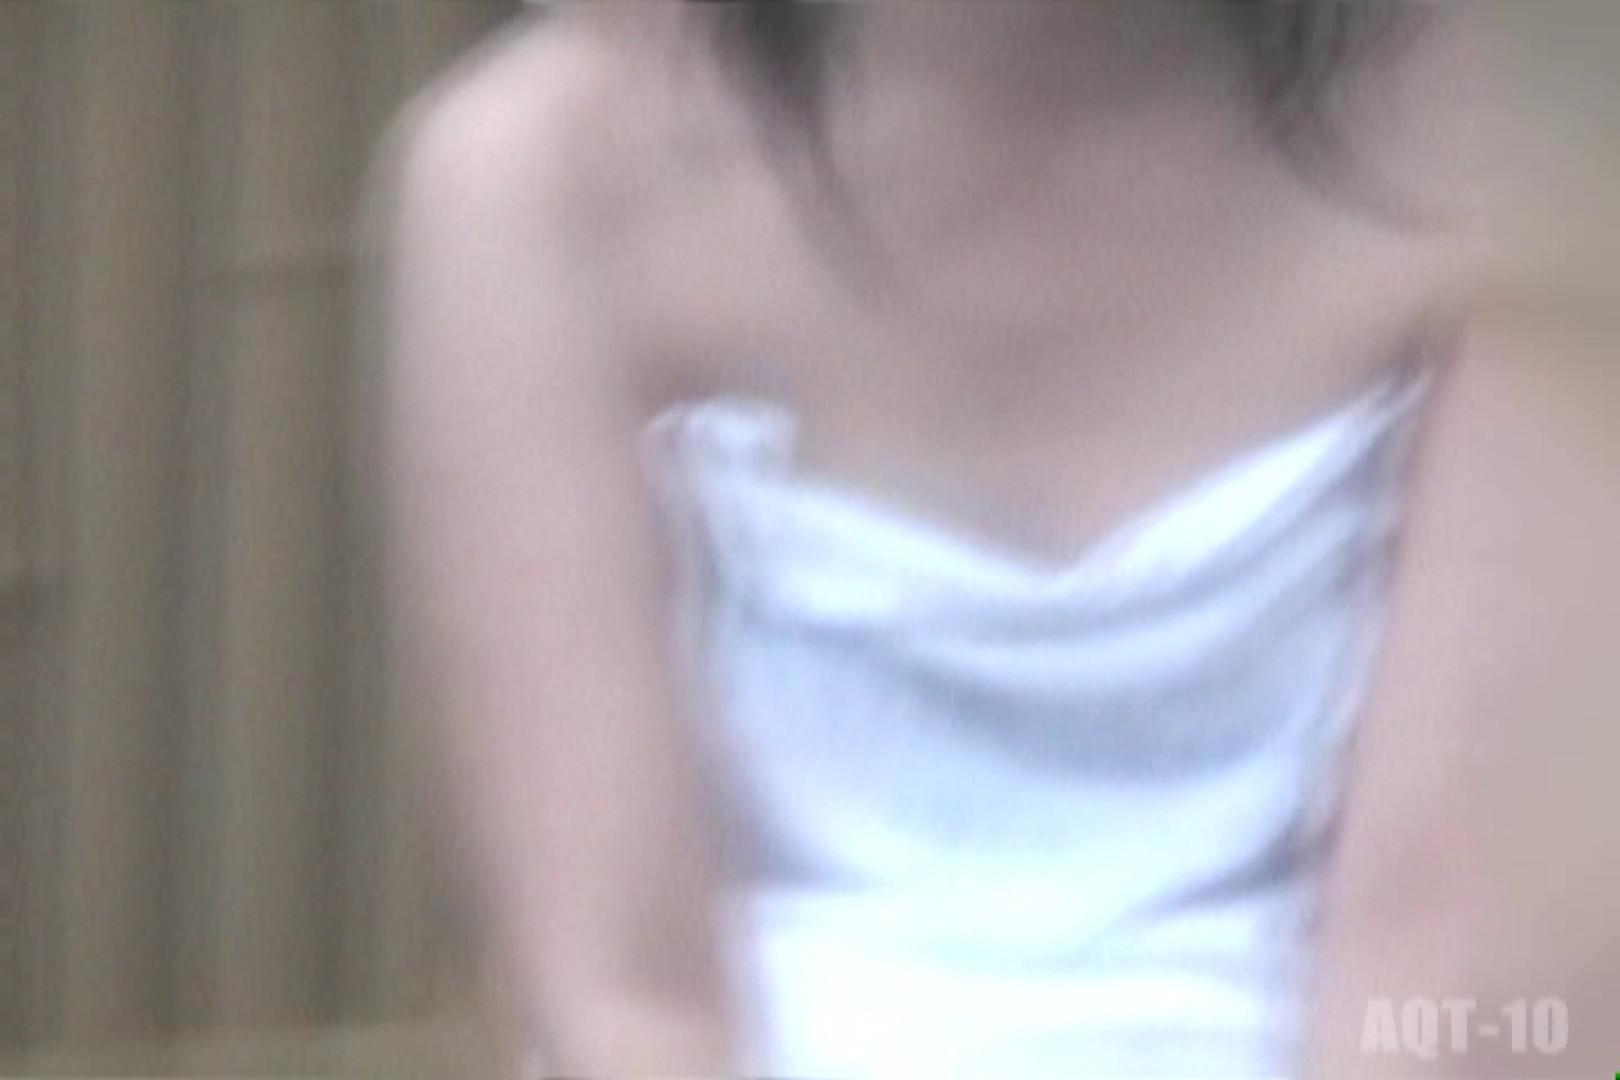 Aquaな露天風呂Vol.796 露天風呂突入 | 盗撮師作品  86pic 46